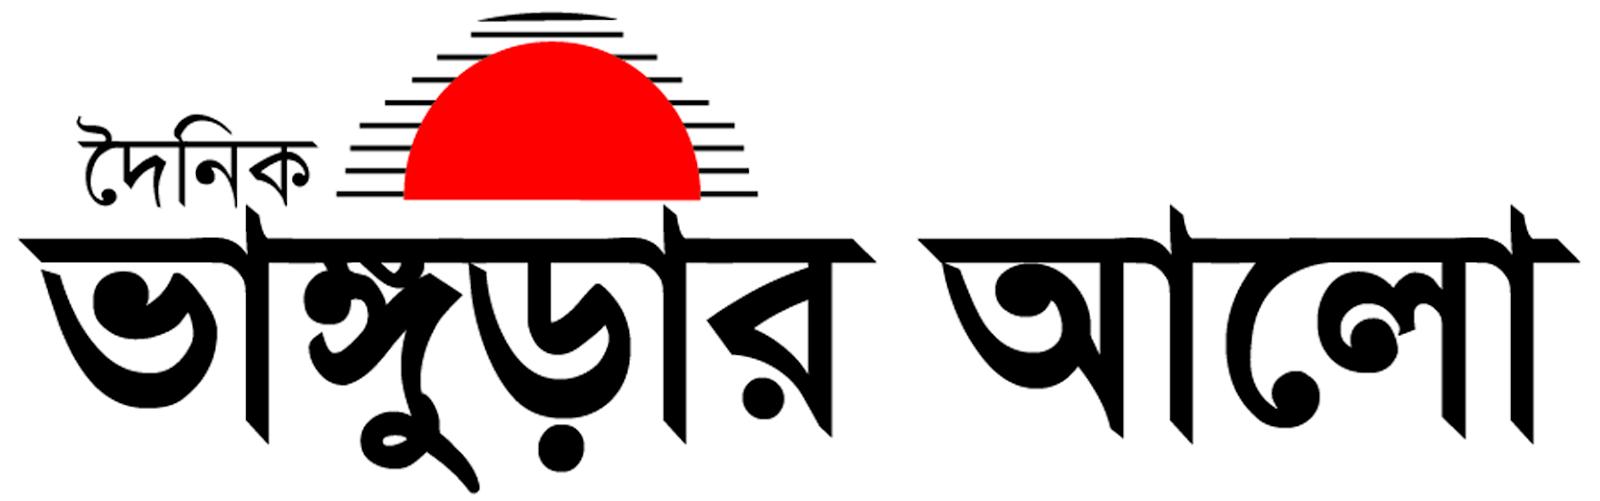 Bhangurar Alo - ভাঙ্গুড়ার আলো